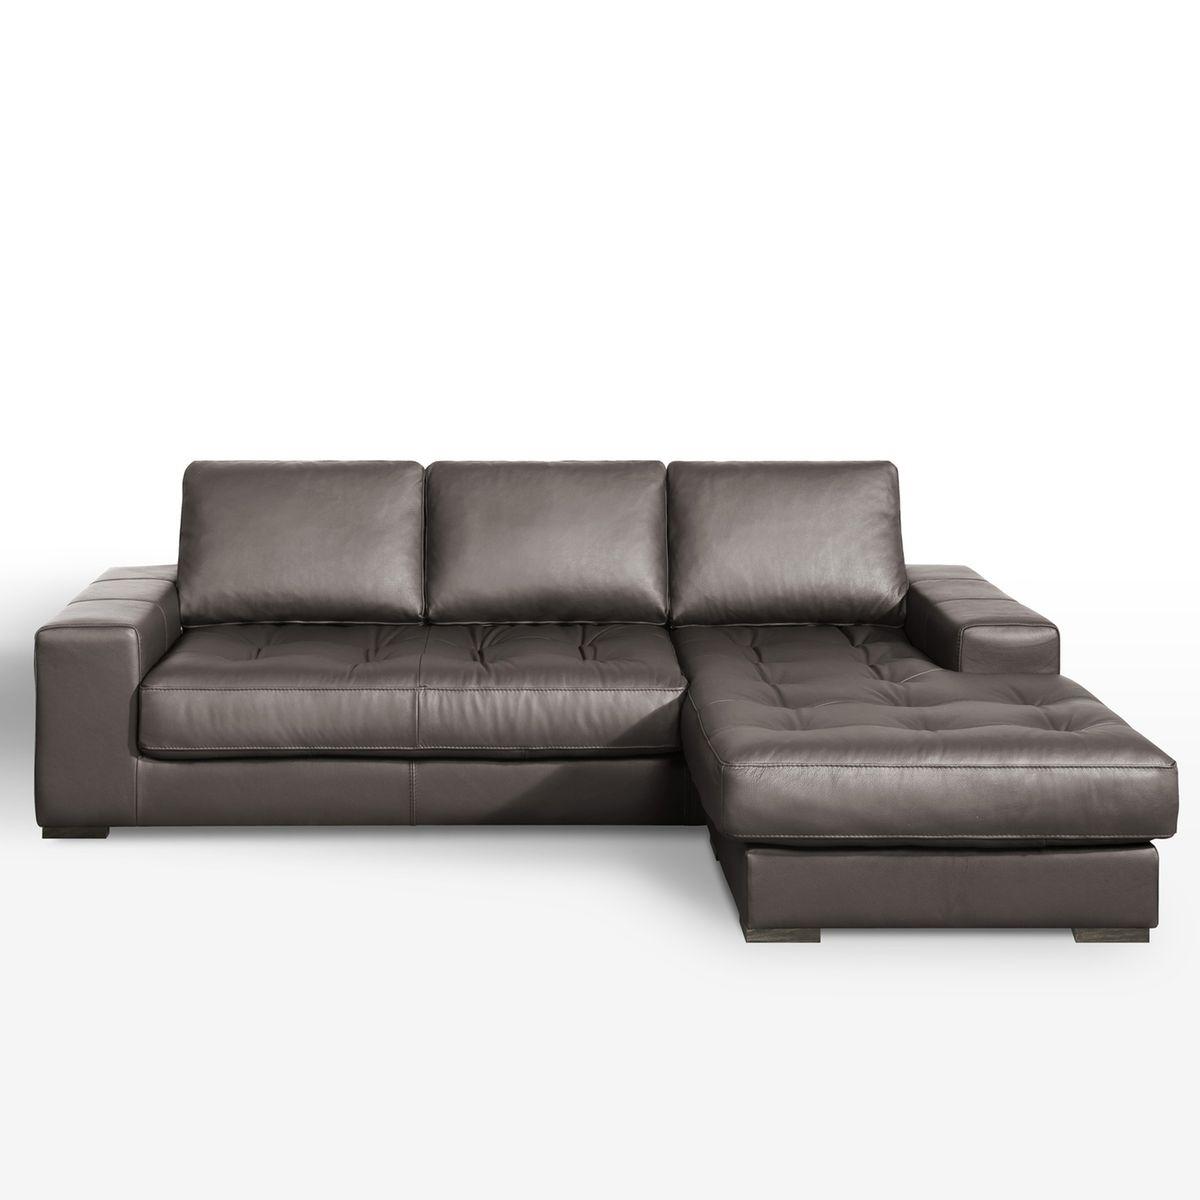 canap d angle fixe confort sup rieur coussins. Black Bedroom Furniture Sets. Home Design Ideas